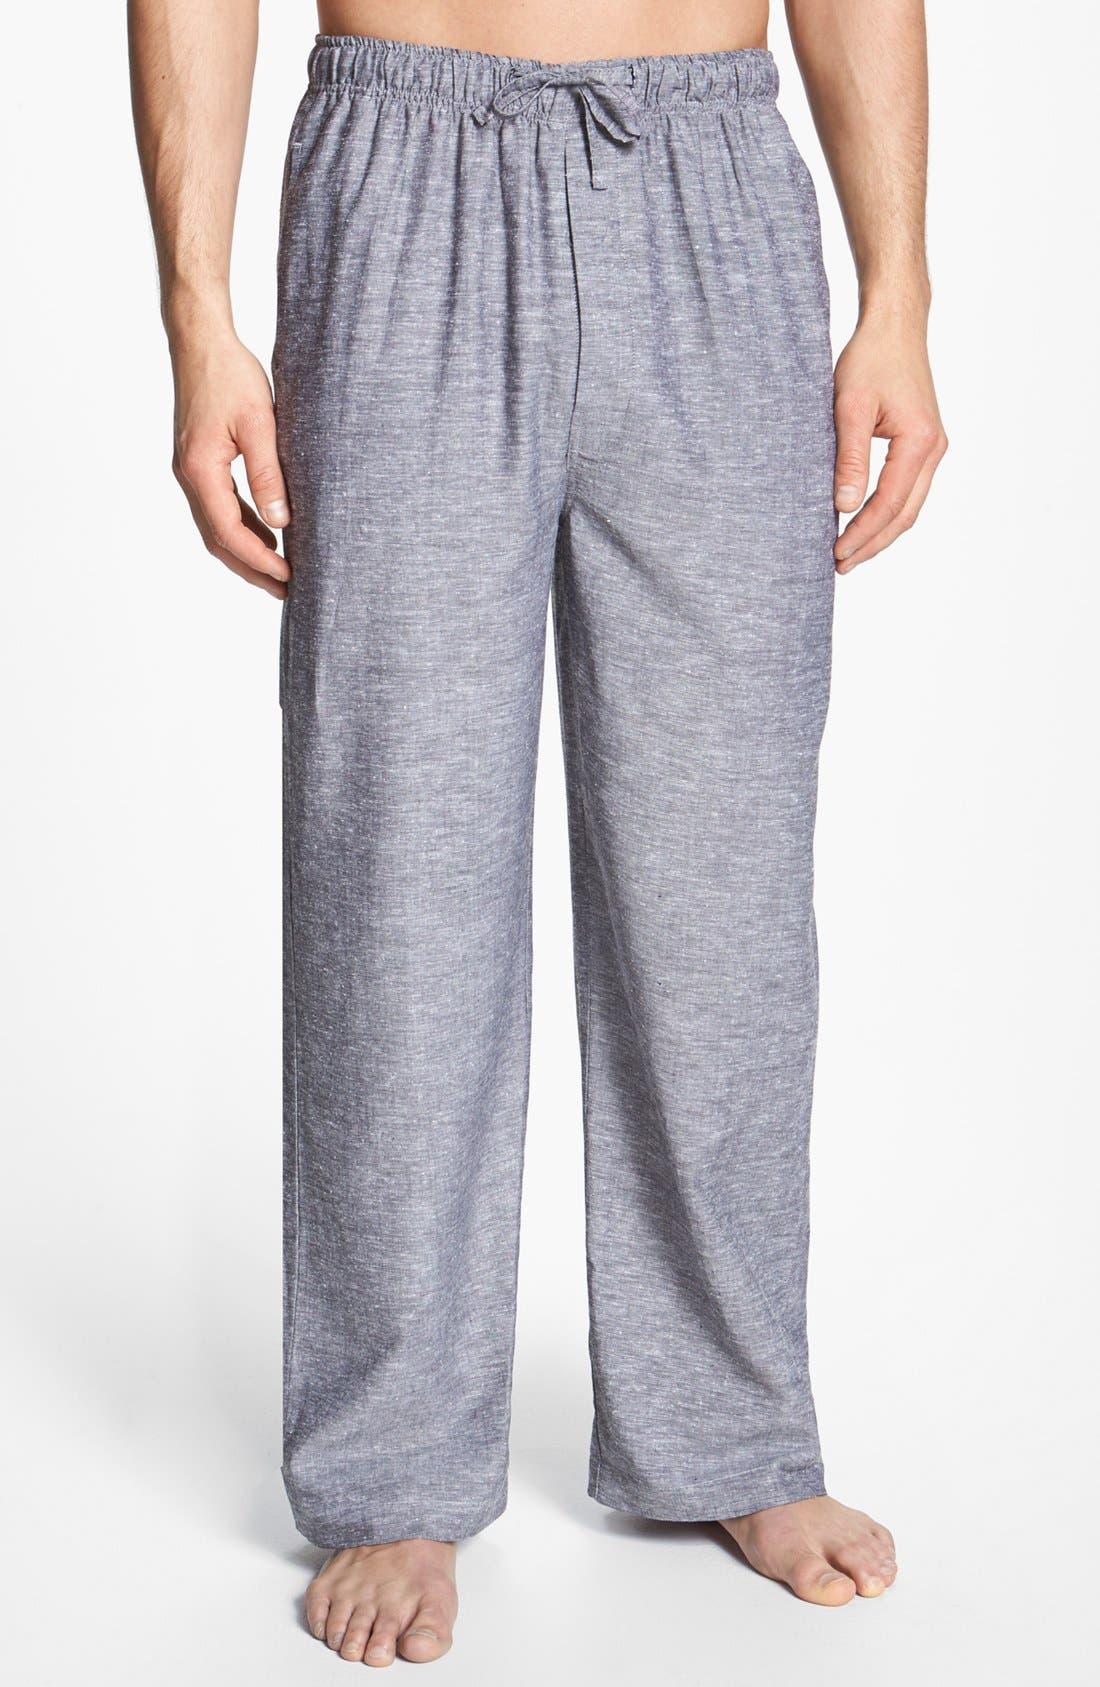 Alternate Image 1 Selected - Majestic International 'La Jolla' Lounge Pants